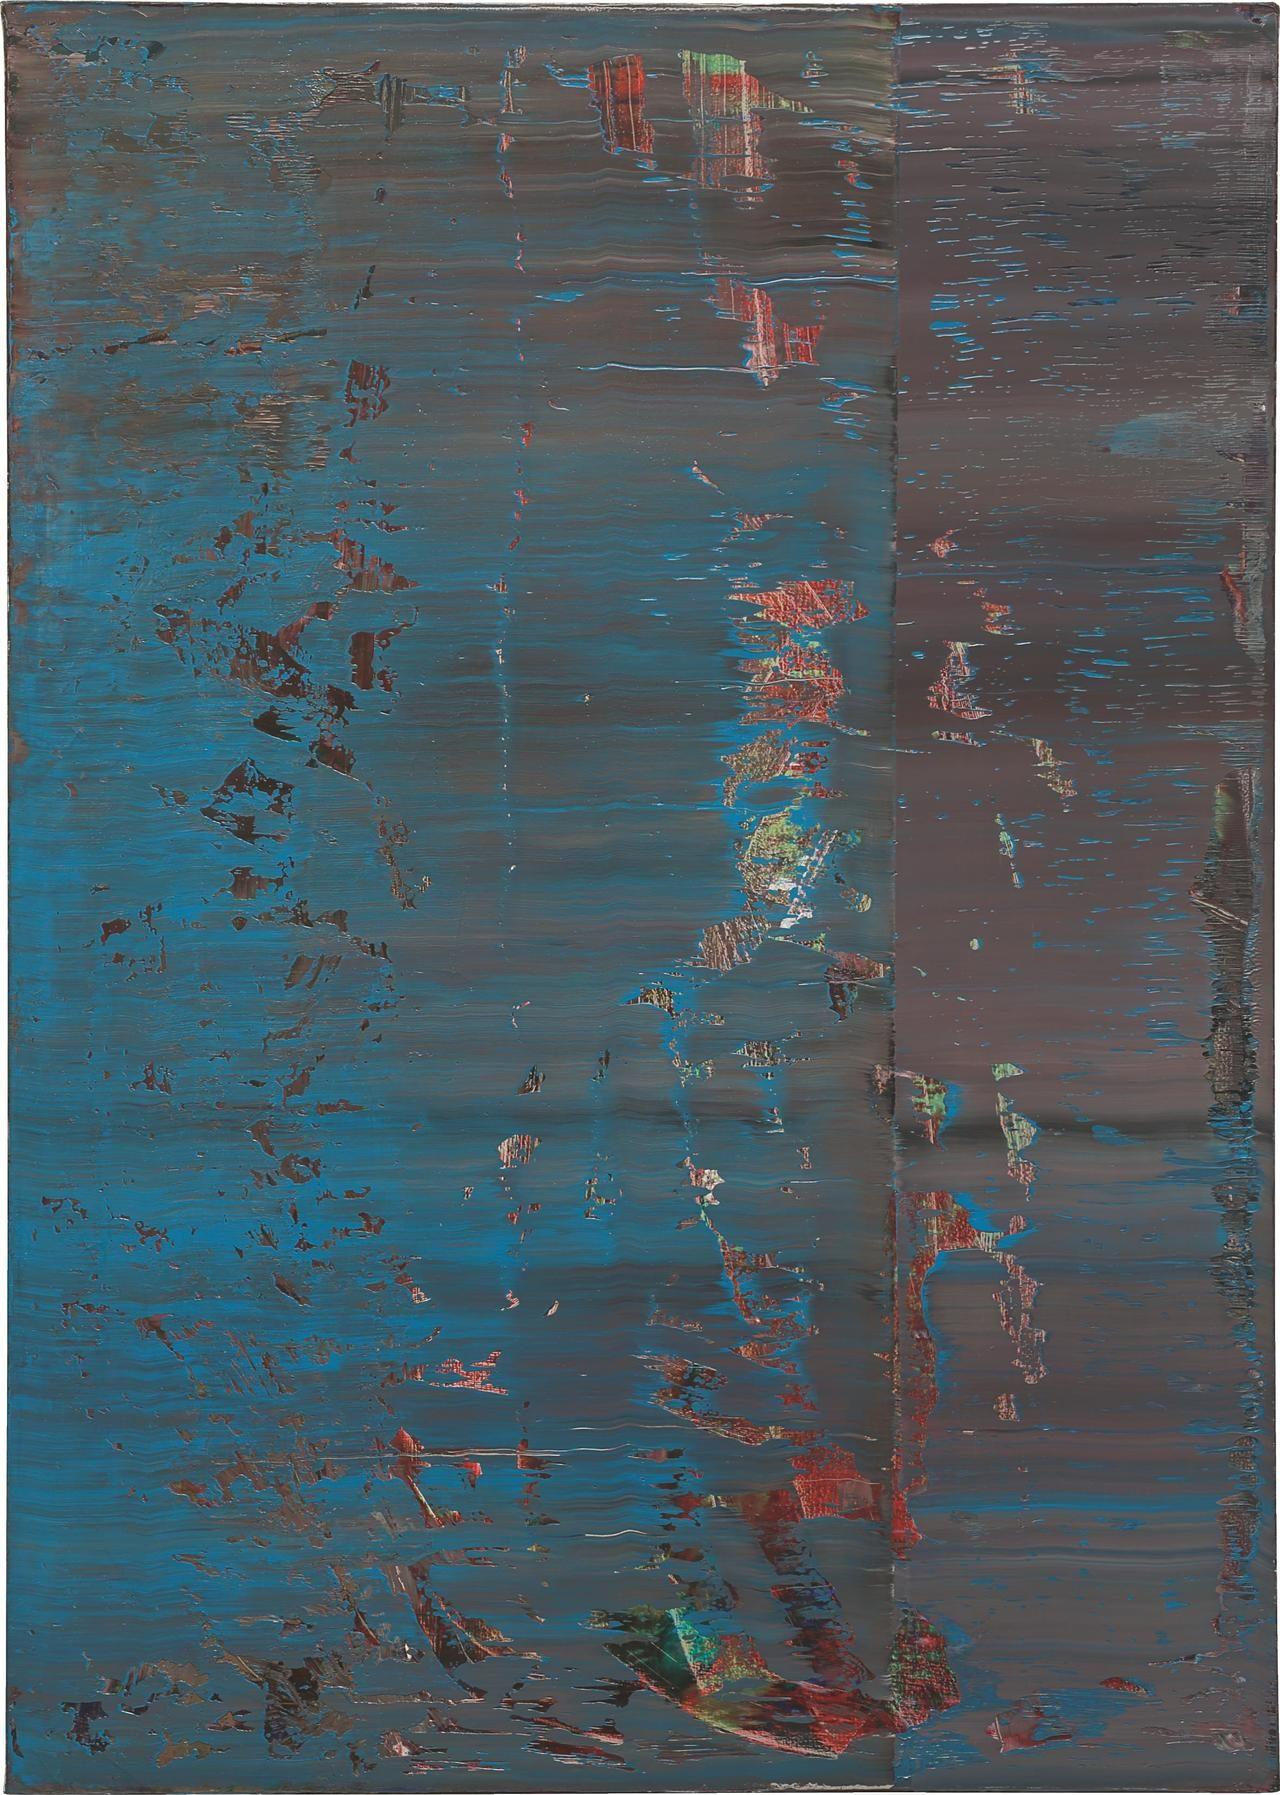 Customized ▲ ✕ Gerhard RichterAbstraktes Bild 638-4, 1987Oil on canvas48 x 341/4 in.